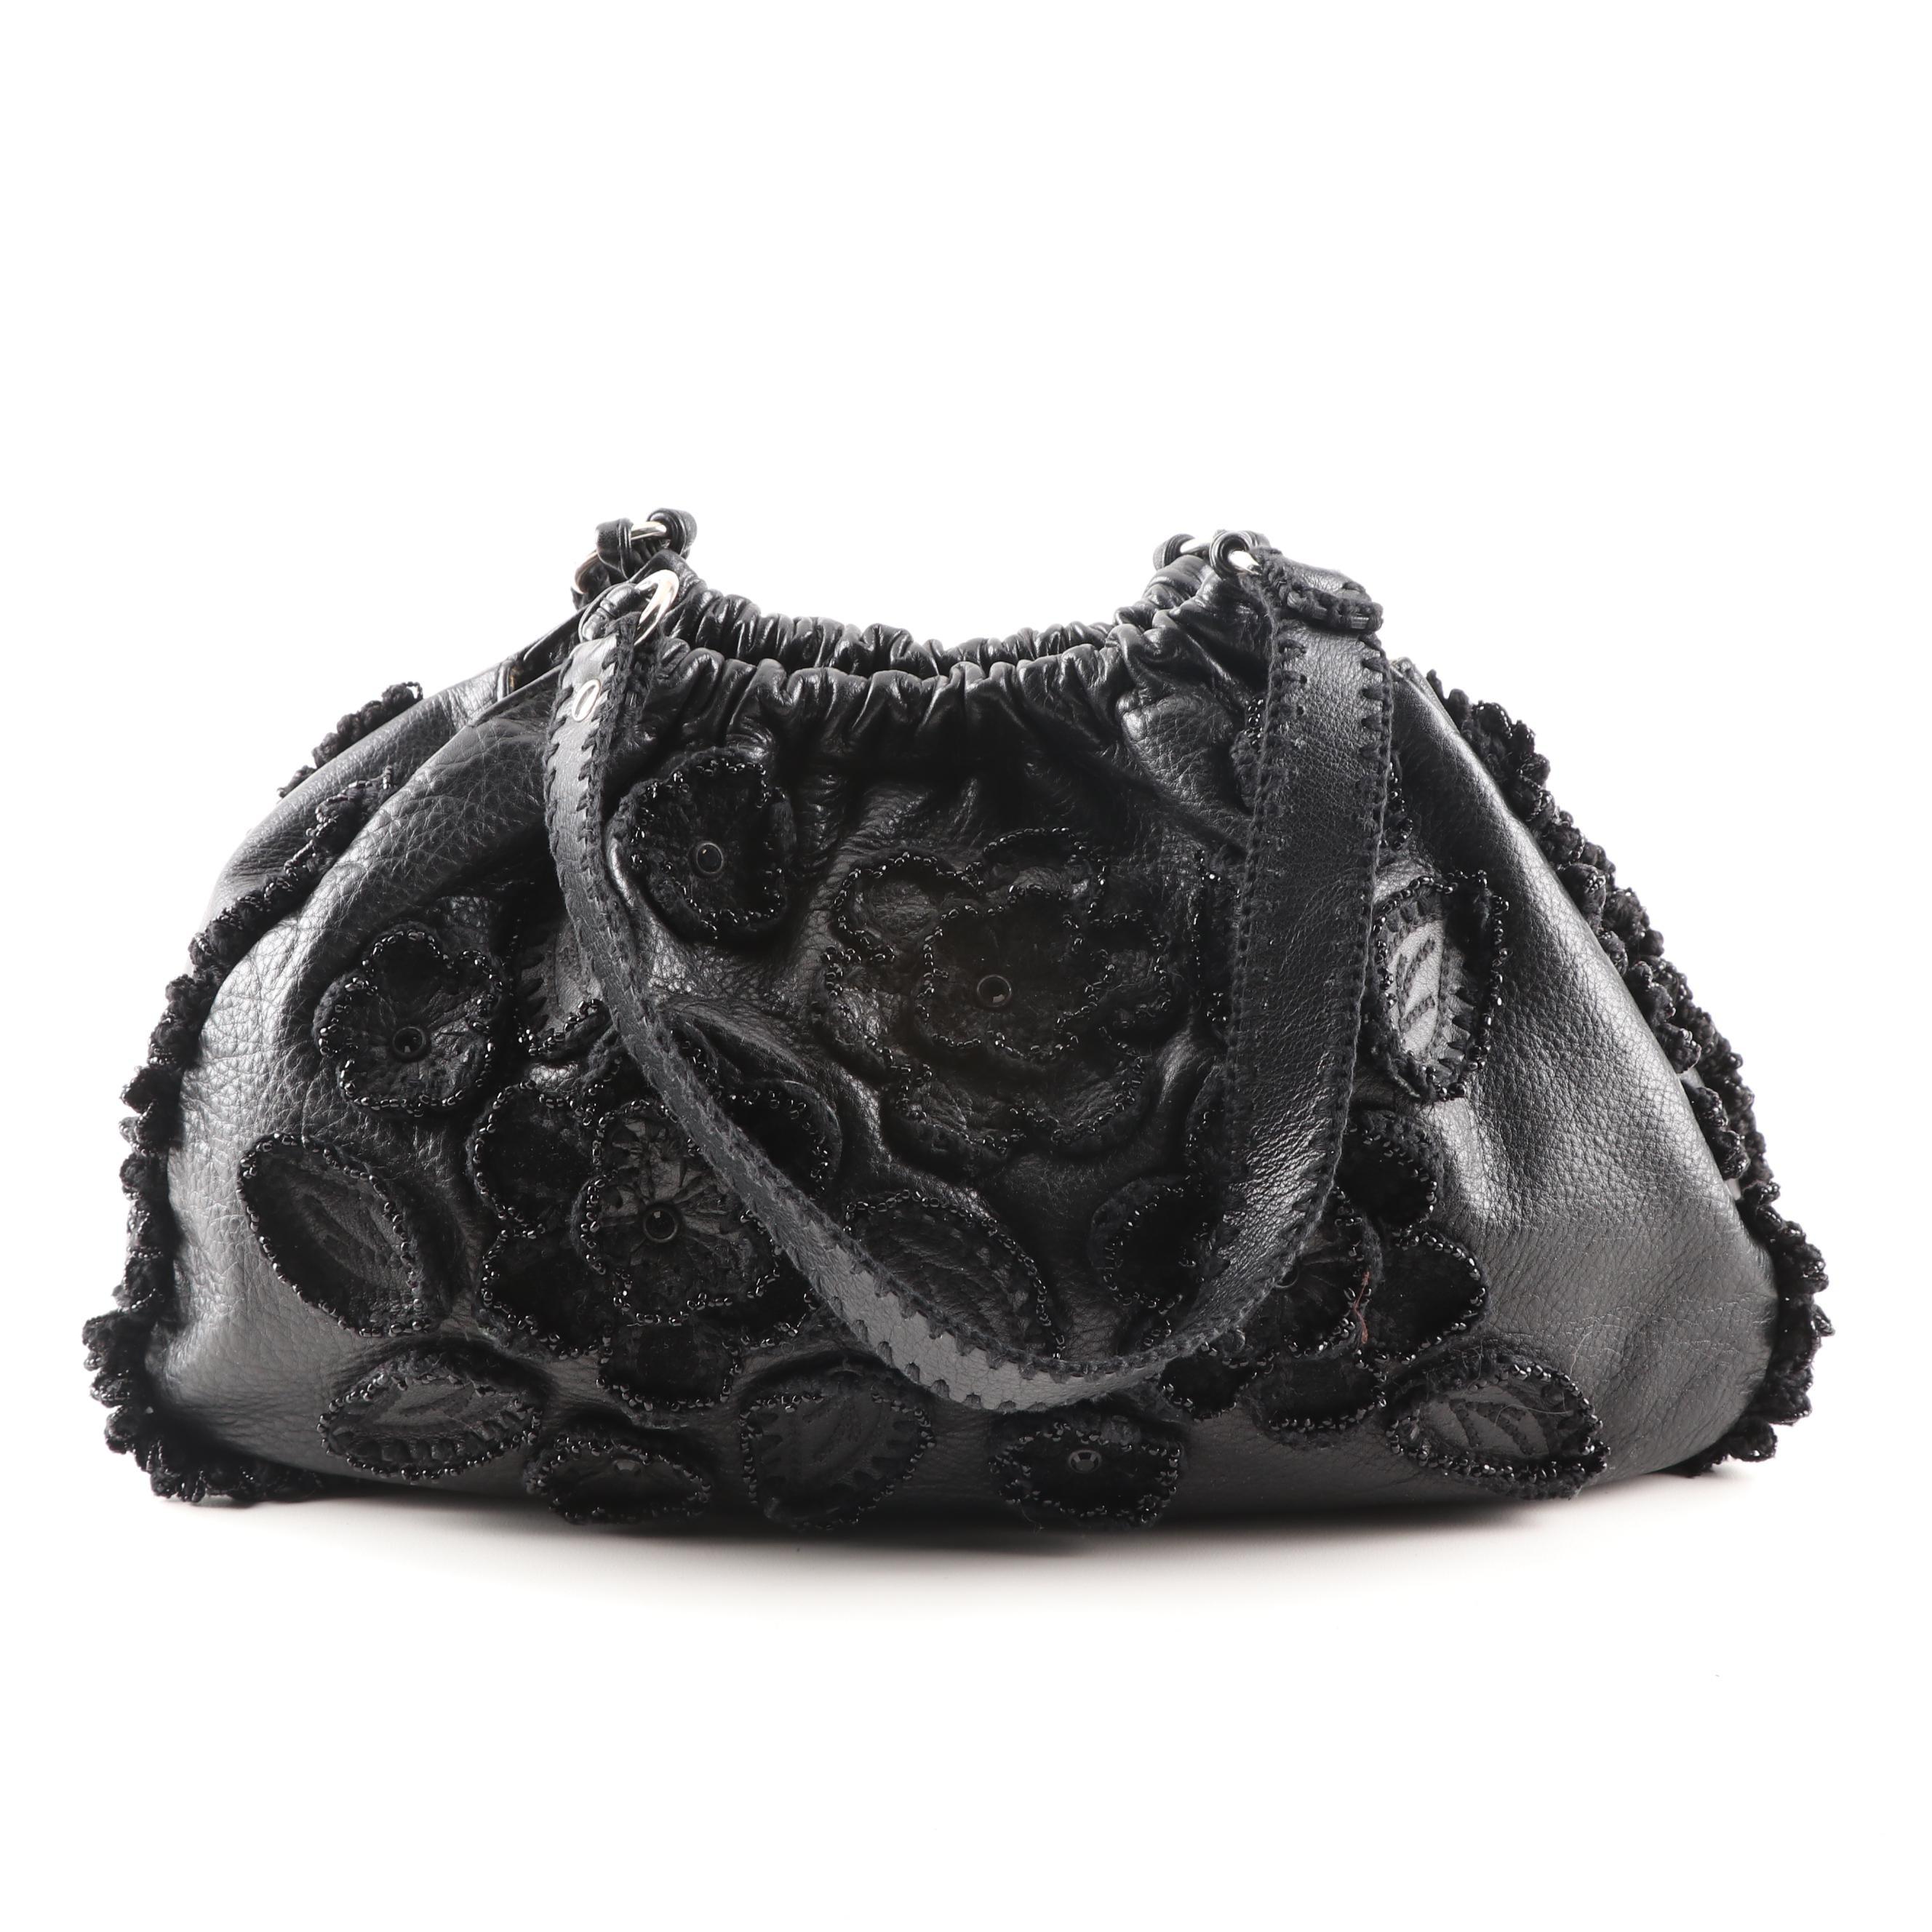 Isabella Fiore Black Leather Beaded Flower Handbag